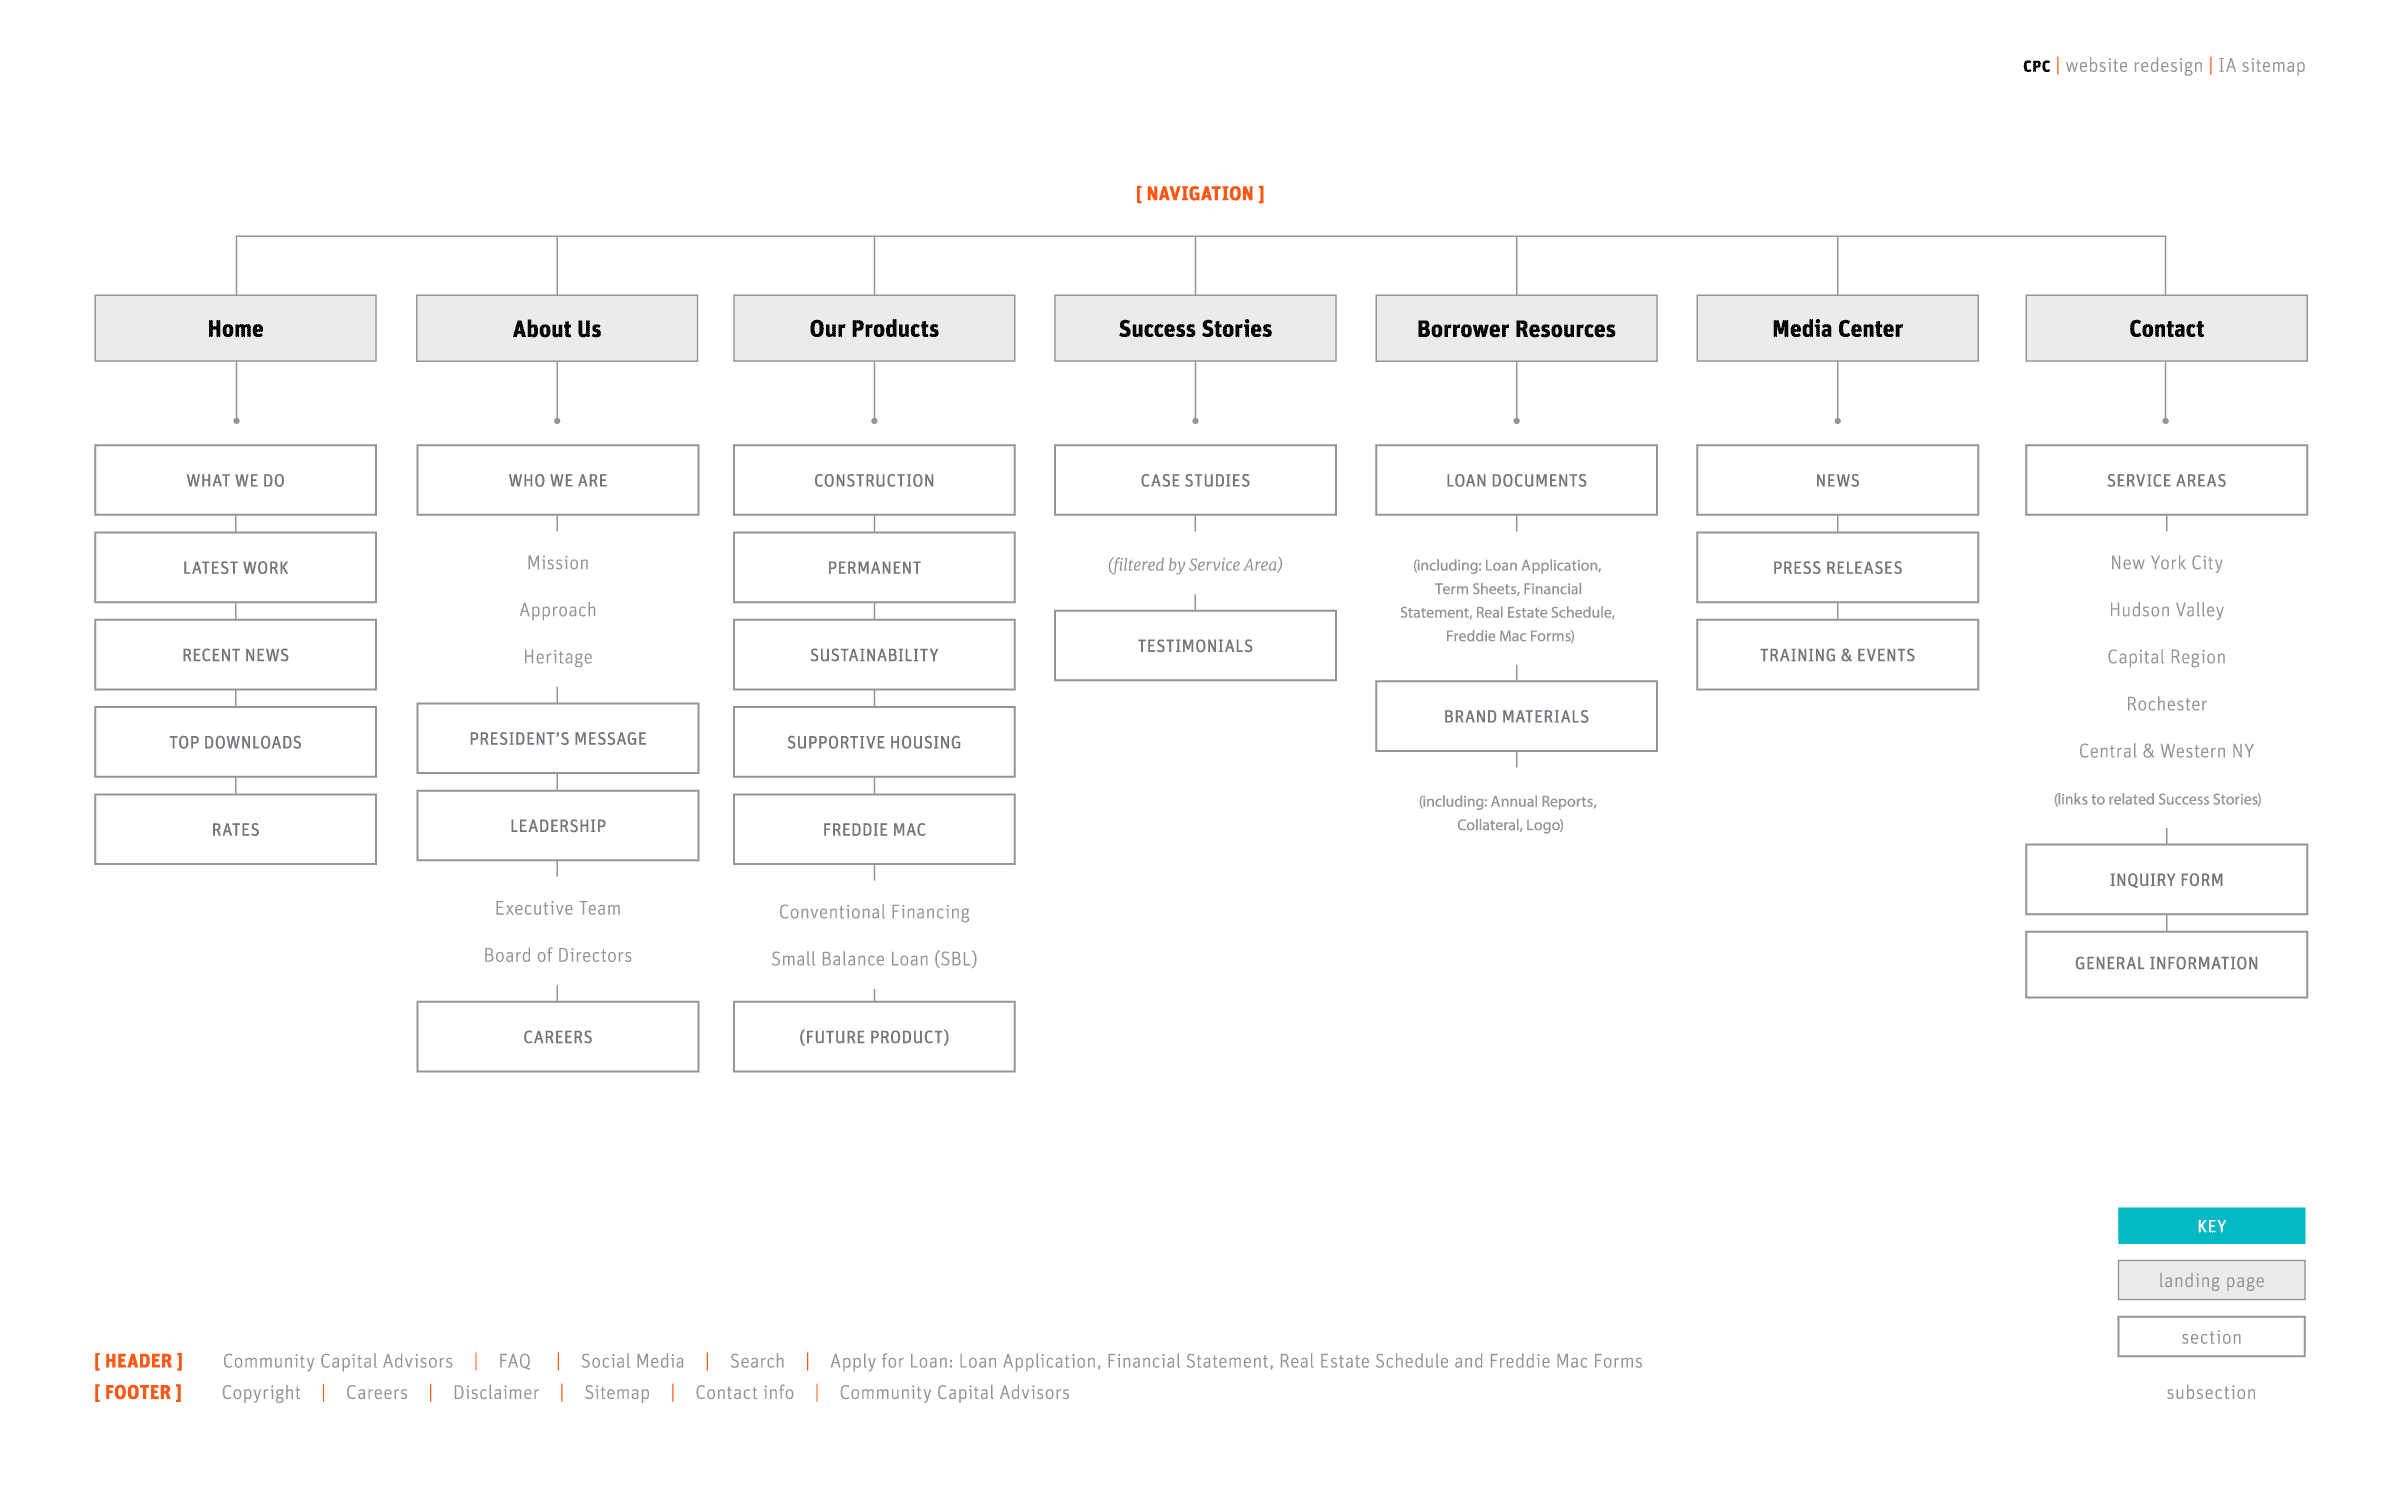 cpc sitemap IA